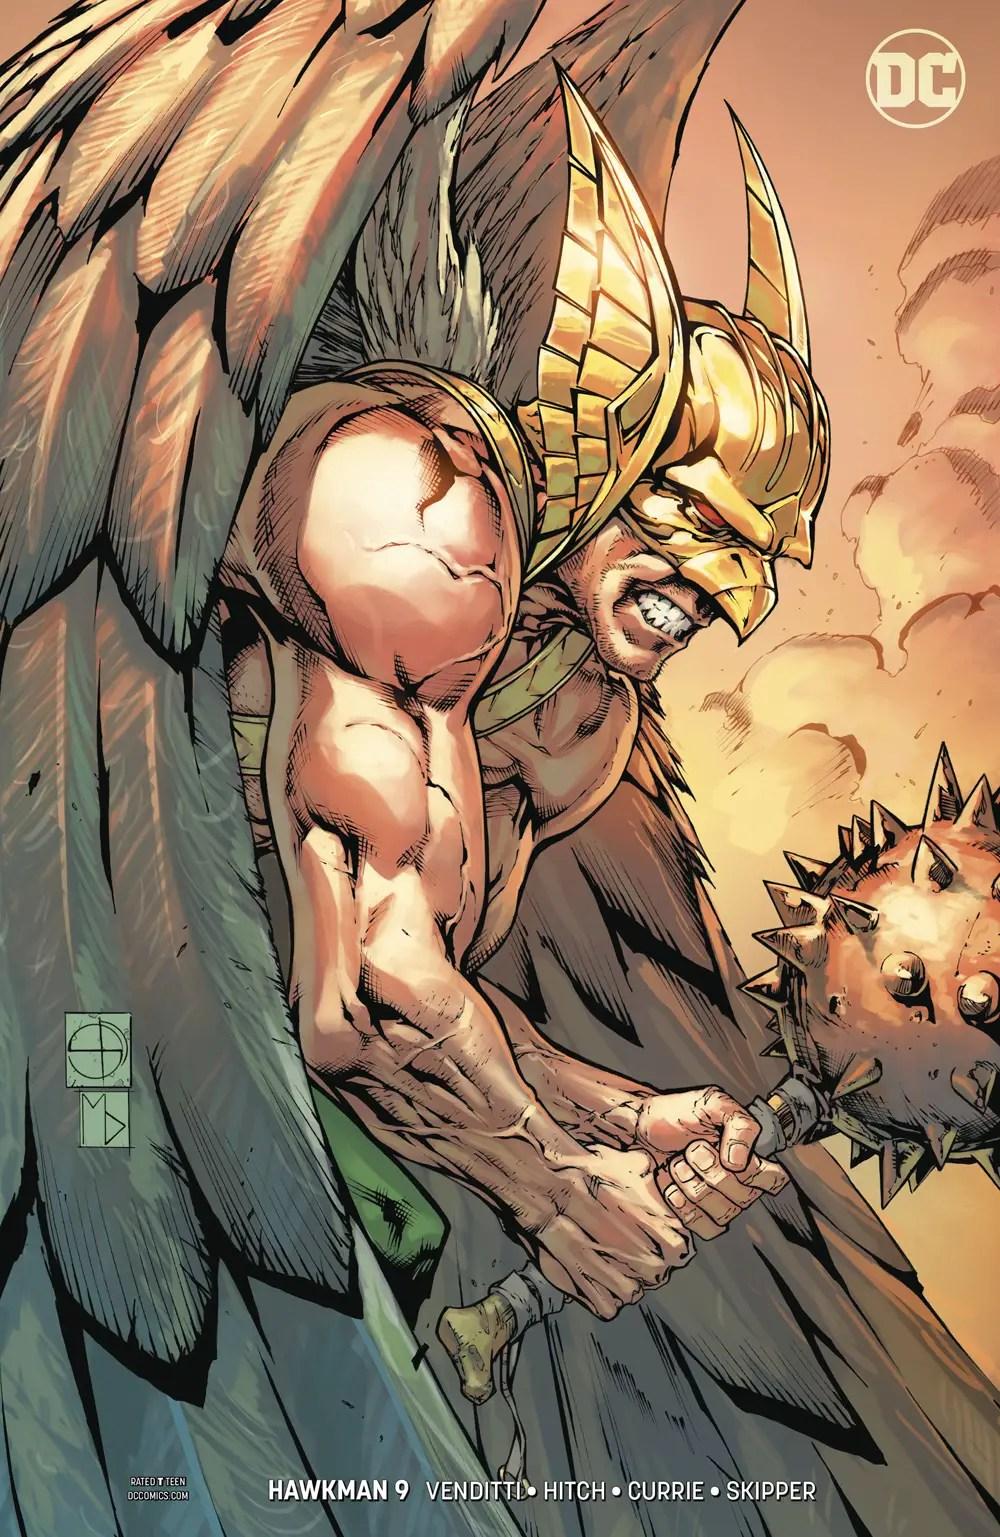 Hawkman #9 review: War Begins